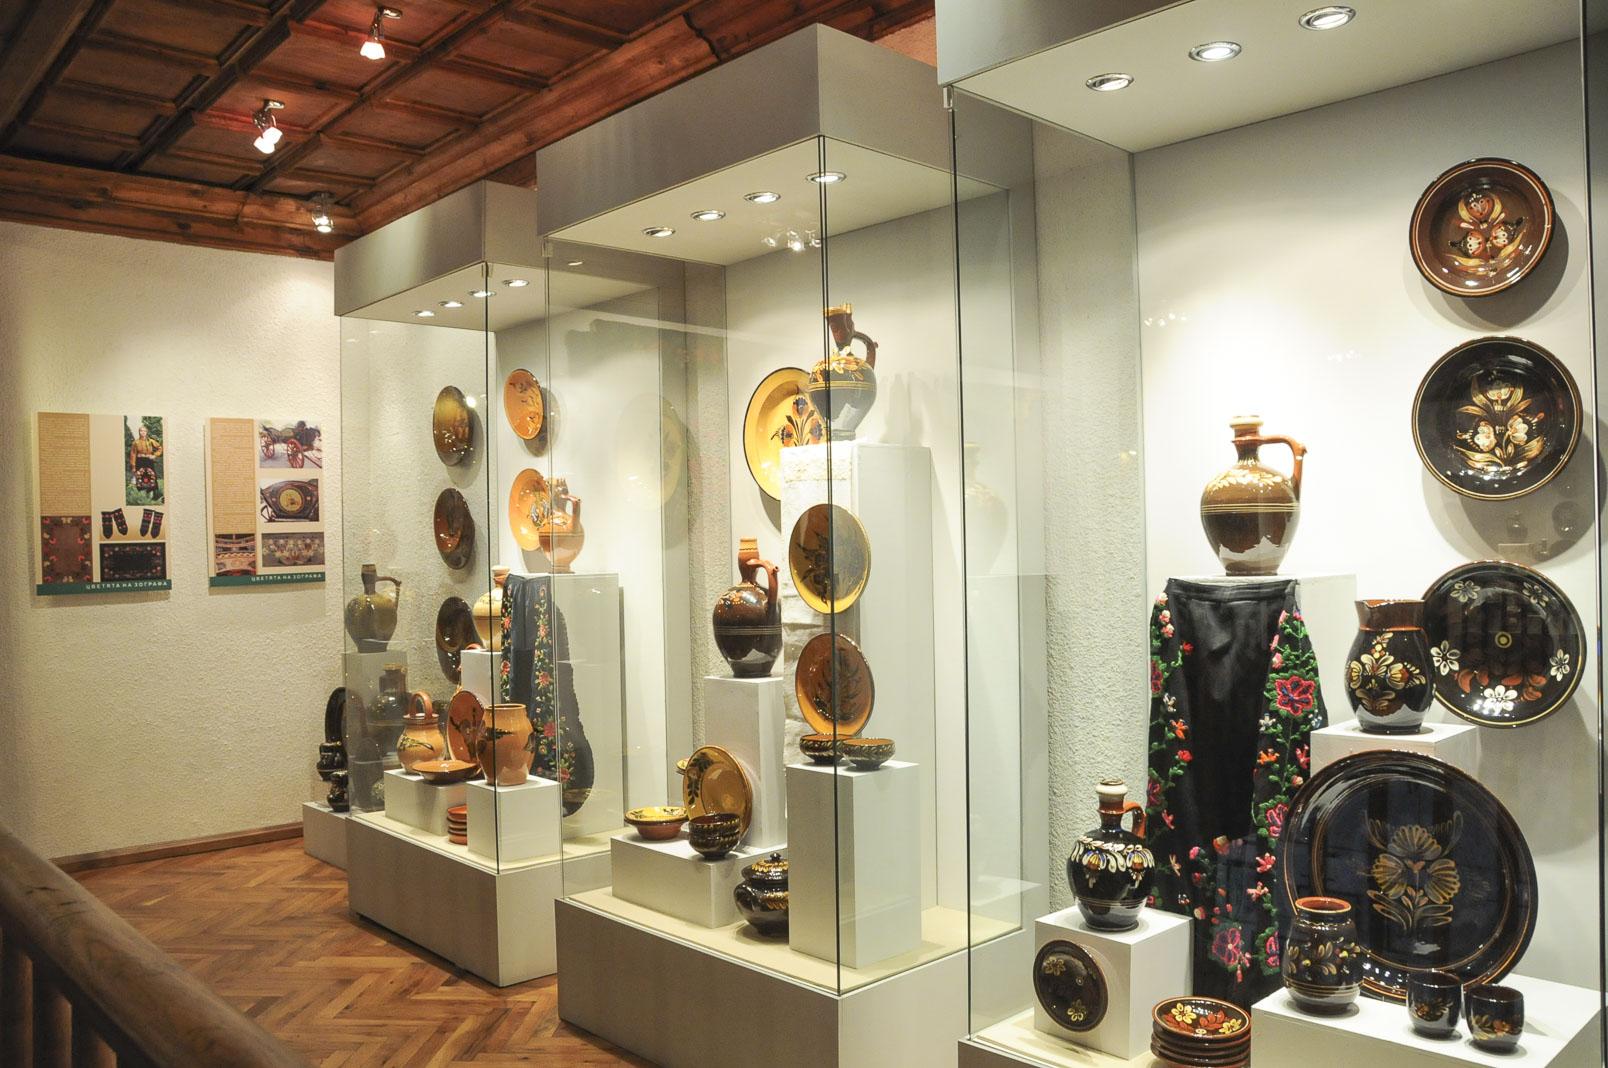 troyan-museum-cvetqta-na-zografa-16